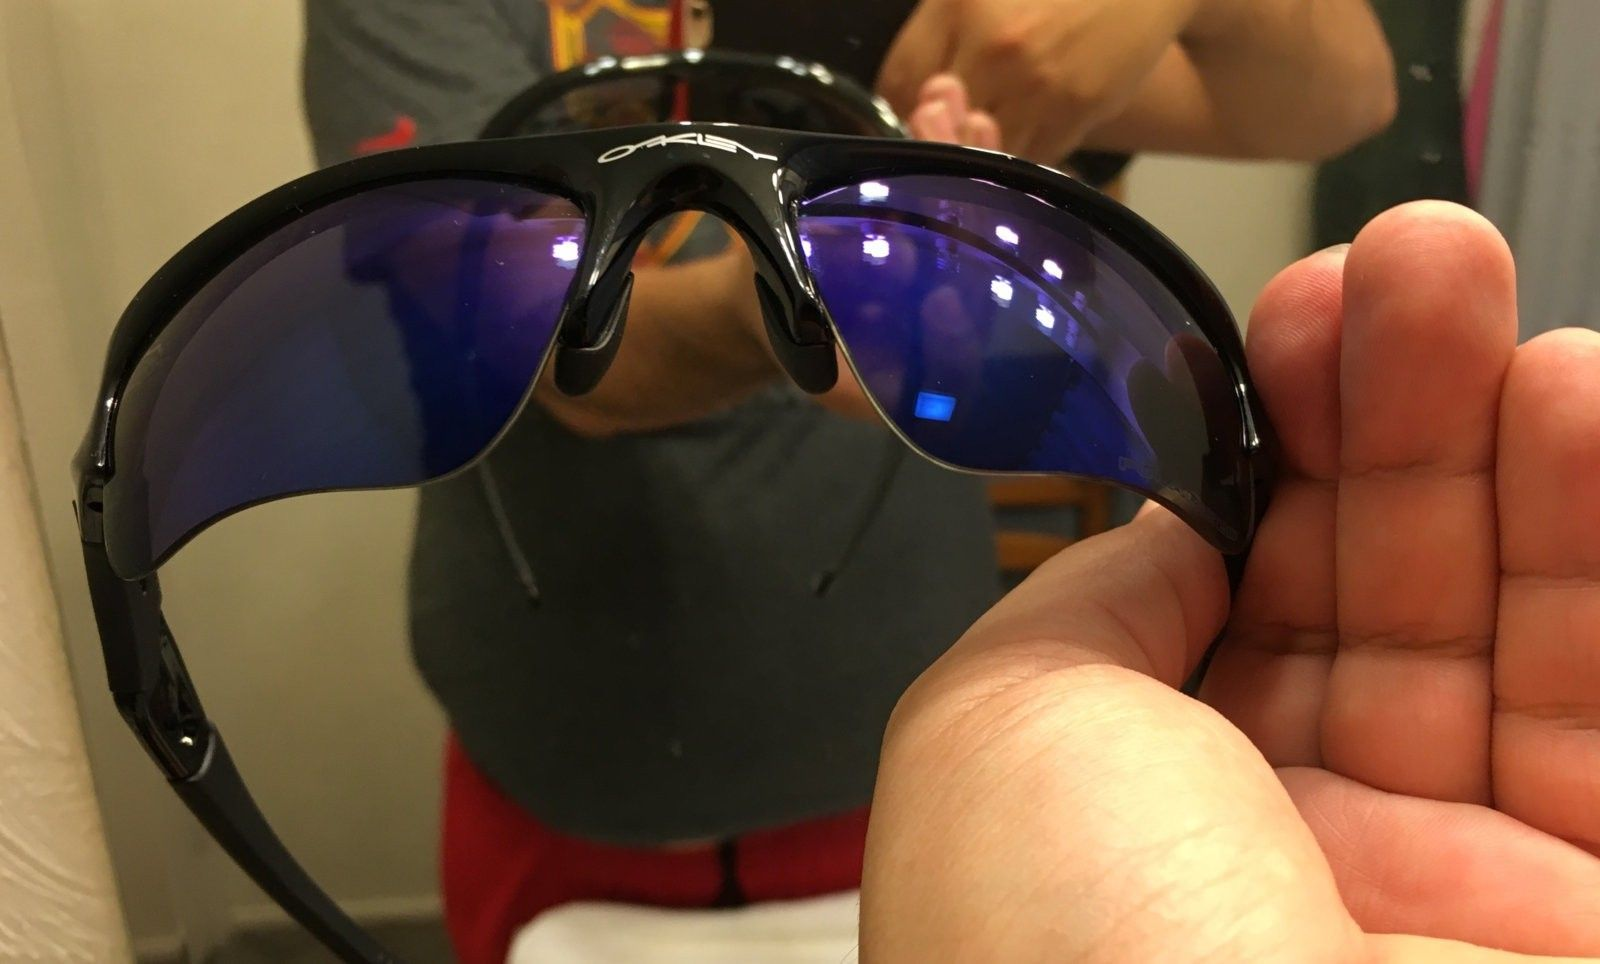 Flak Jacket 1.0 - 2 pairs - Polarized lenses - 2016-07-07 19.24.00.jpg